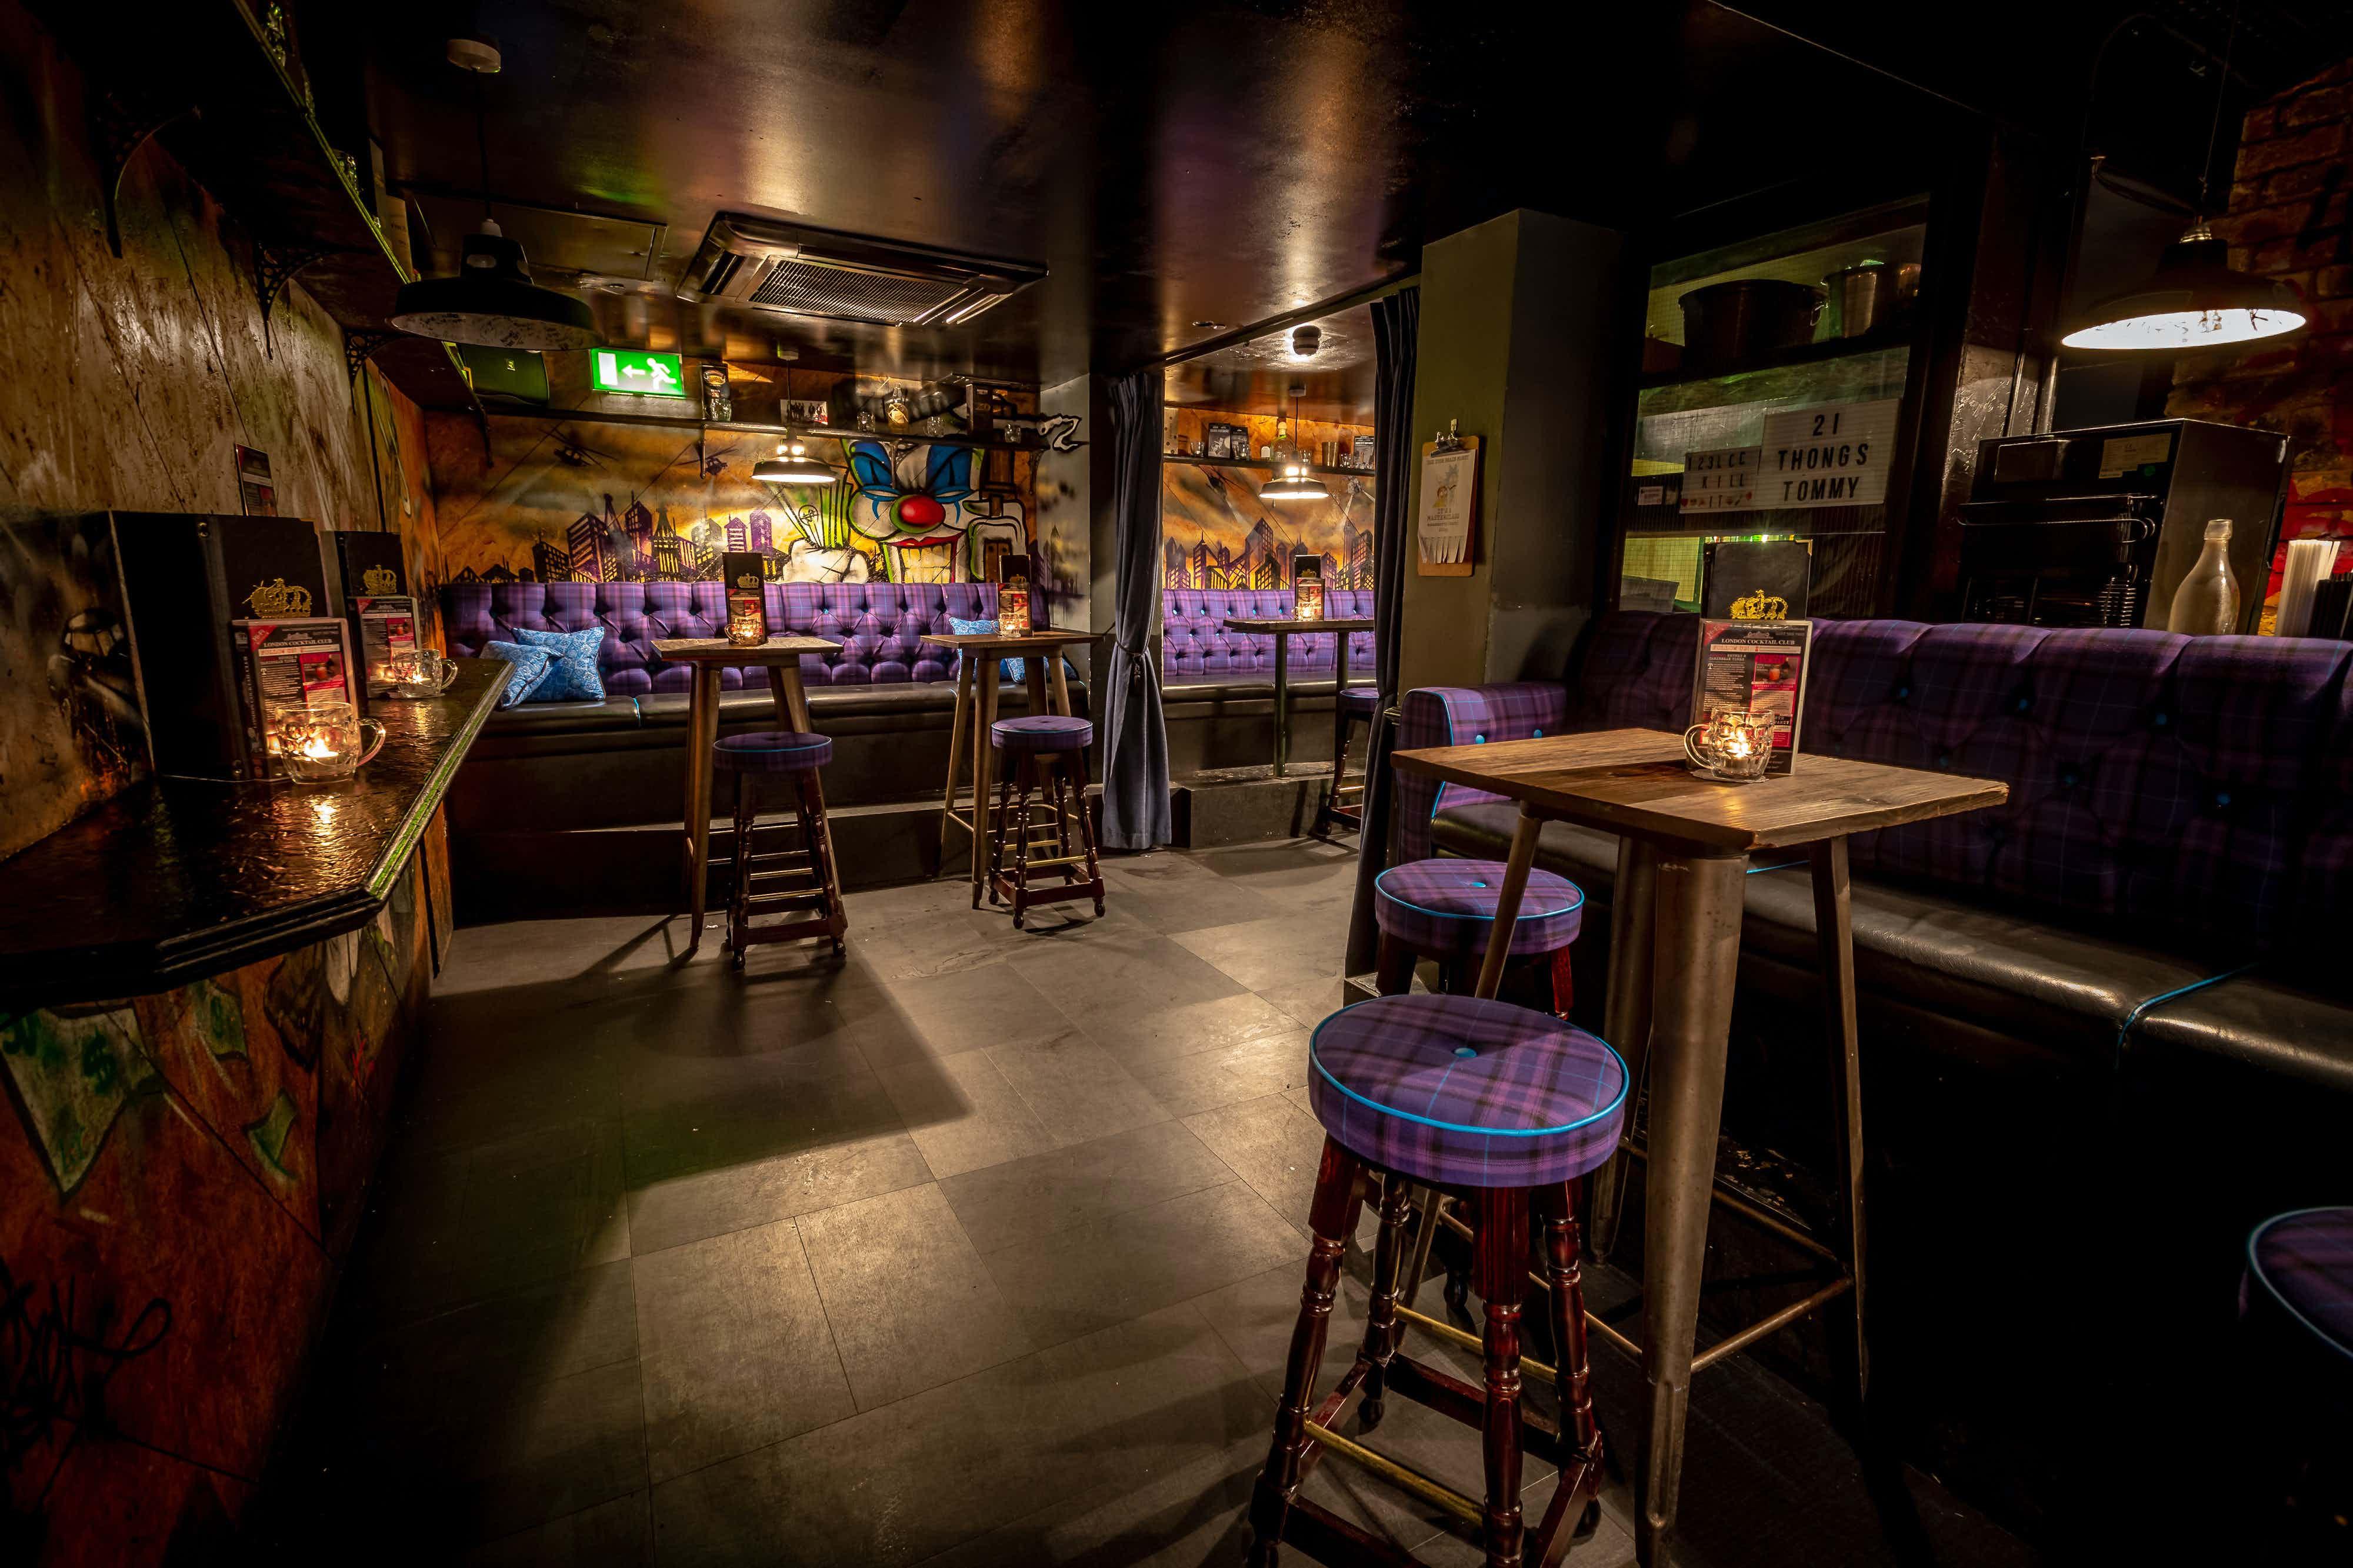 London Cocktail Club Oxford Circus , London Cocktail Club Oxford Circus